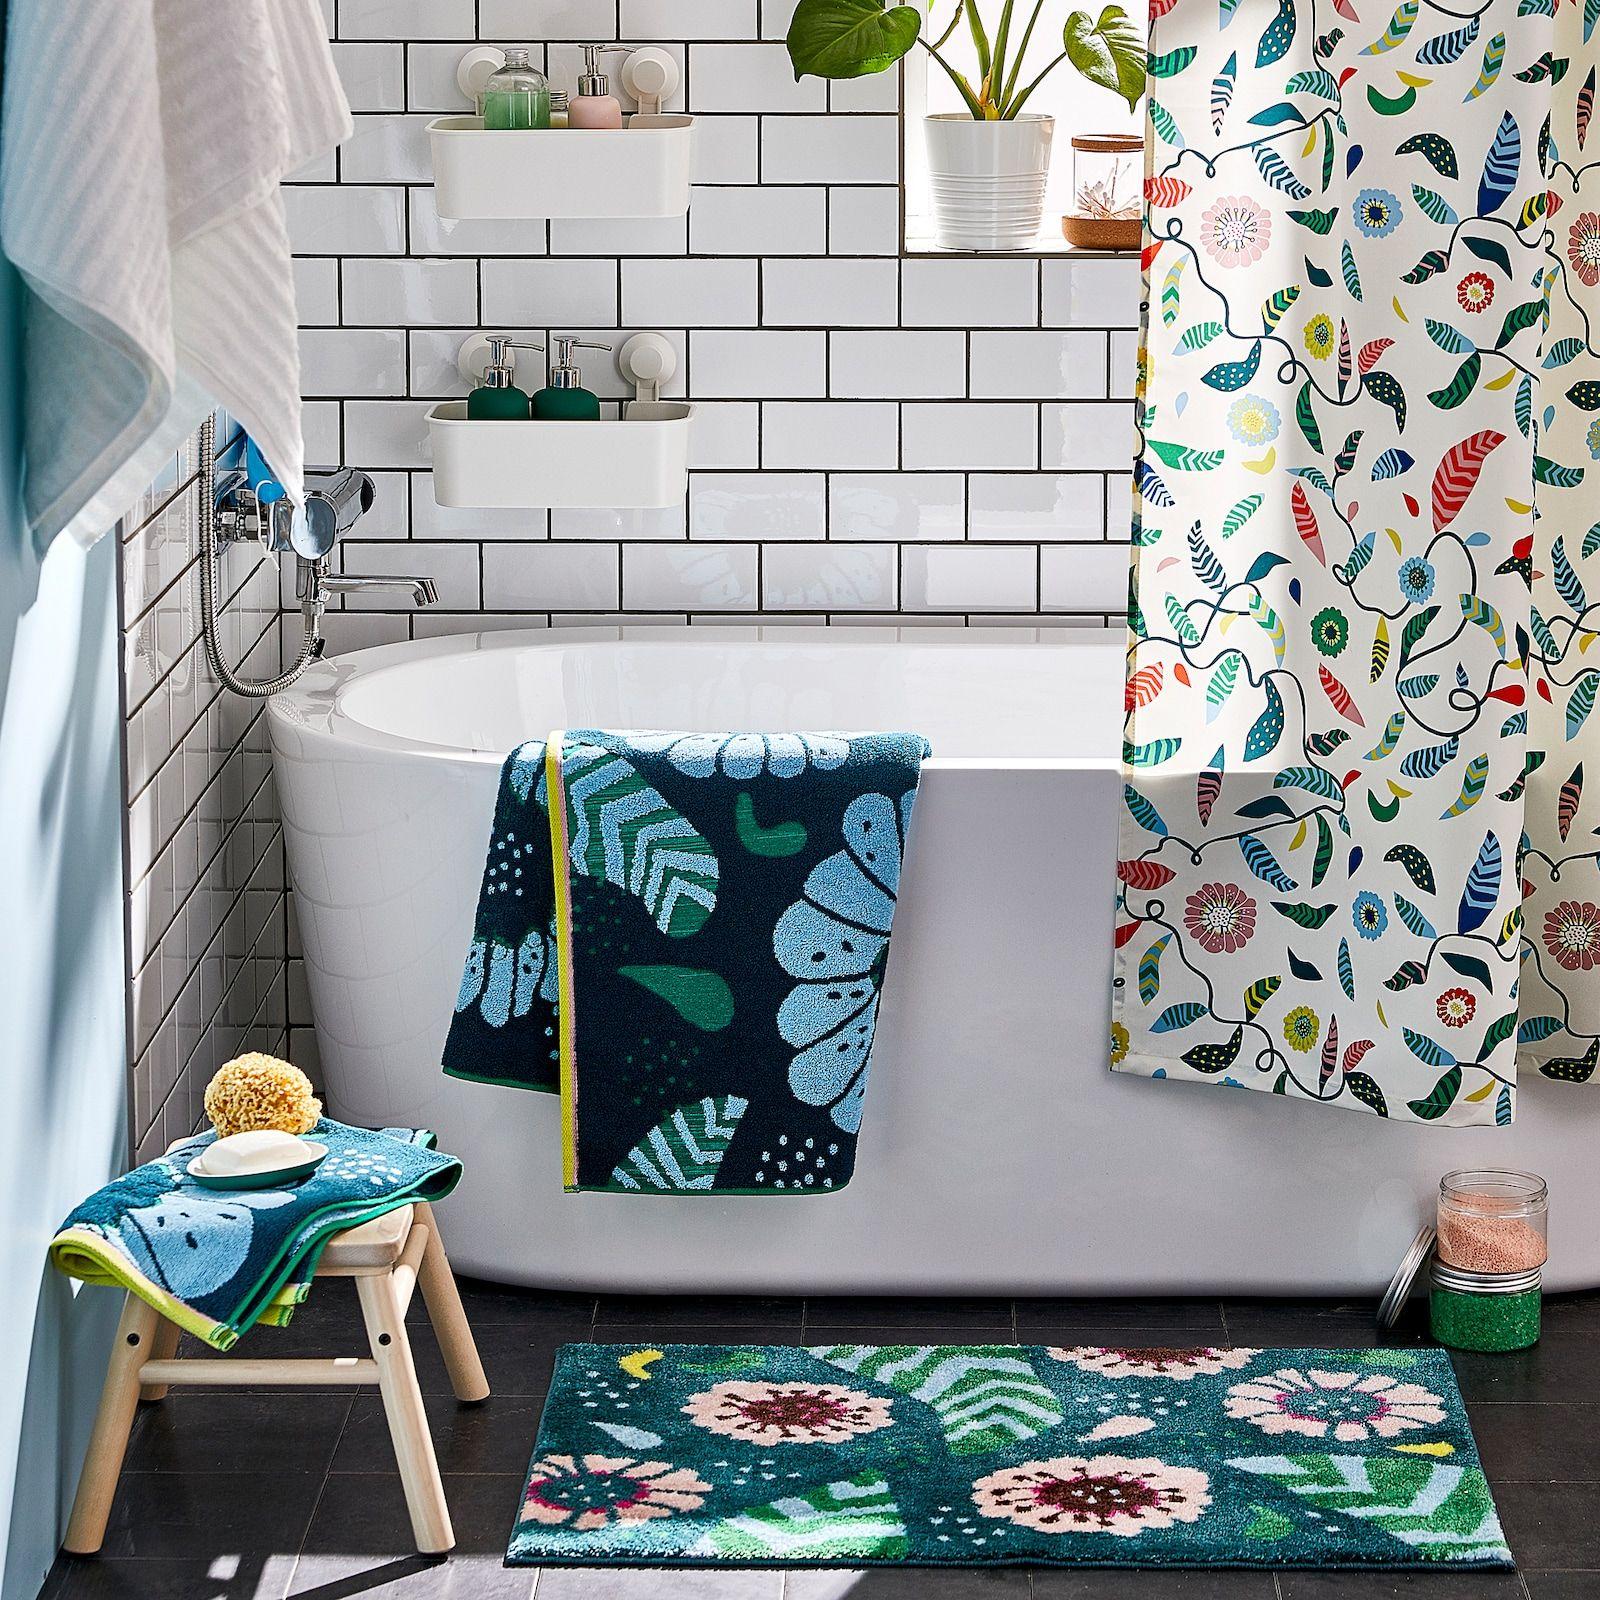 38+ Tapis salle de bain ikea ideas in 2021